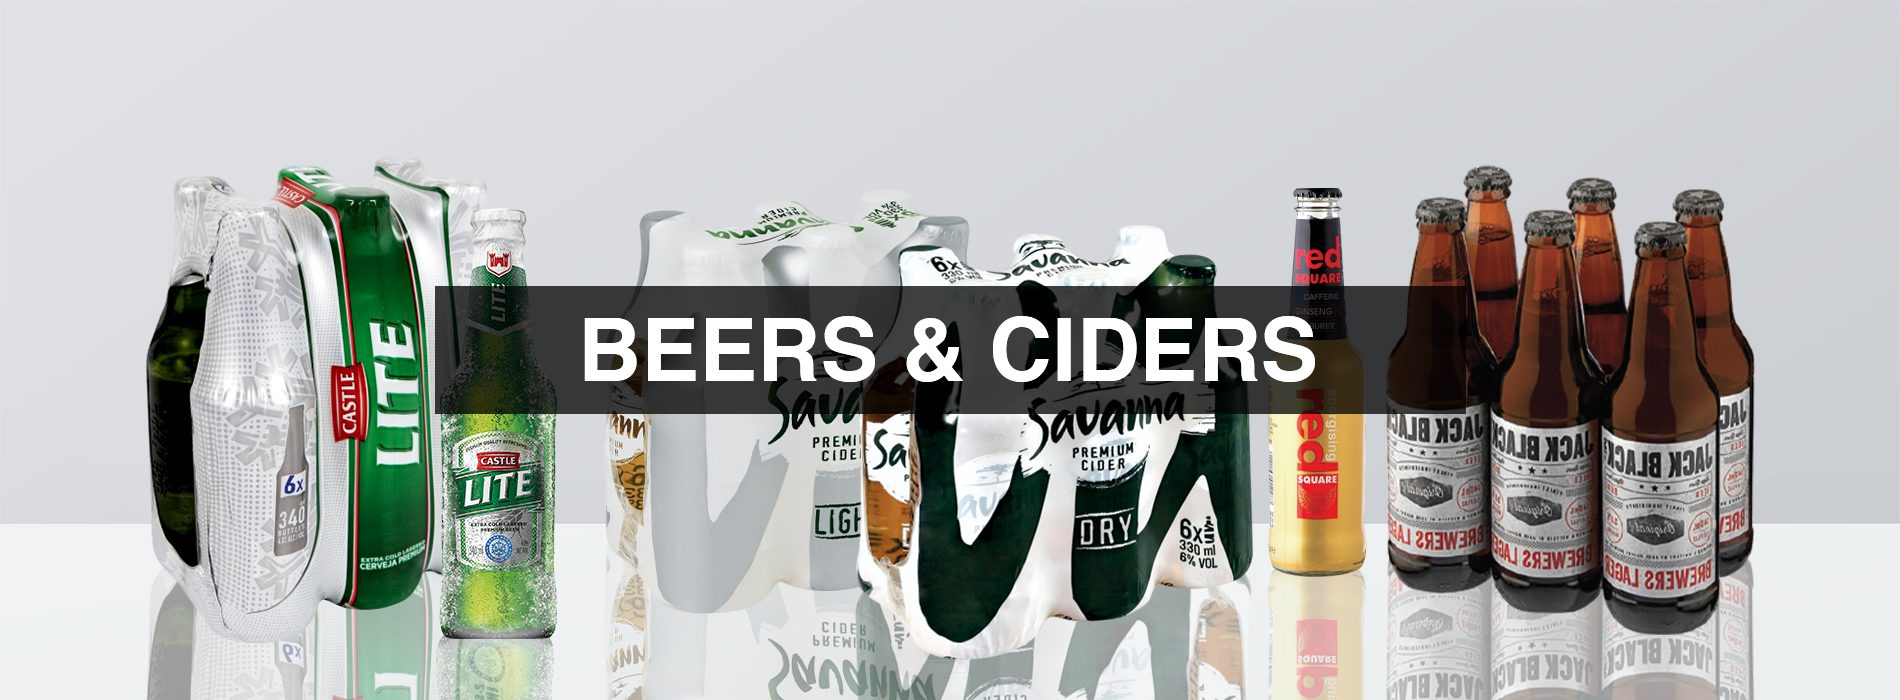 Beers&Ciders